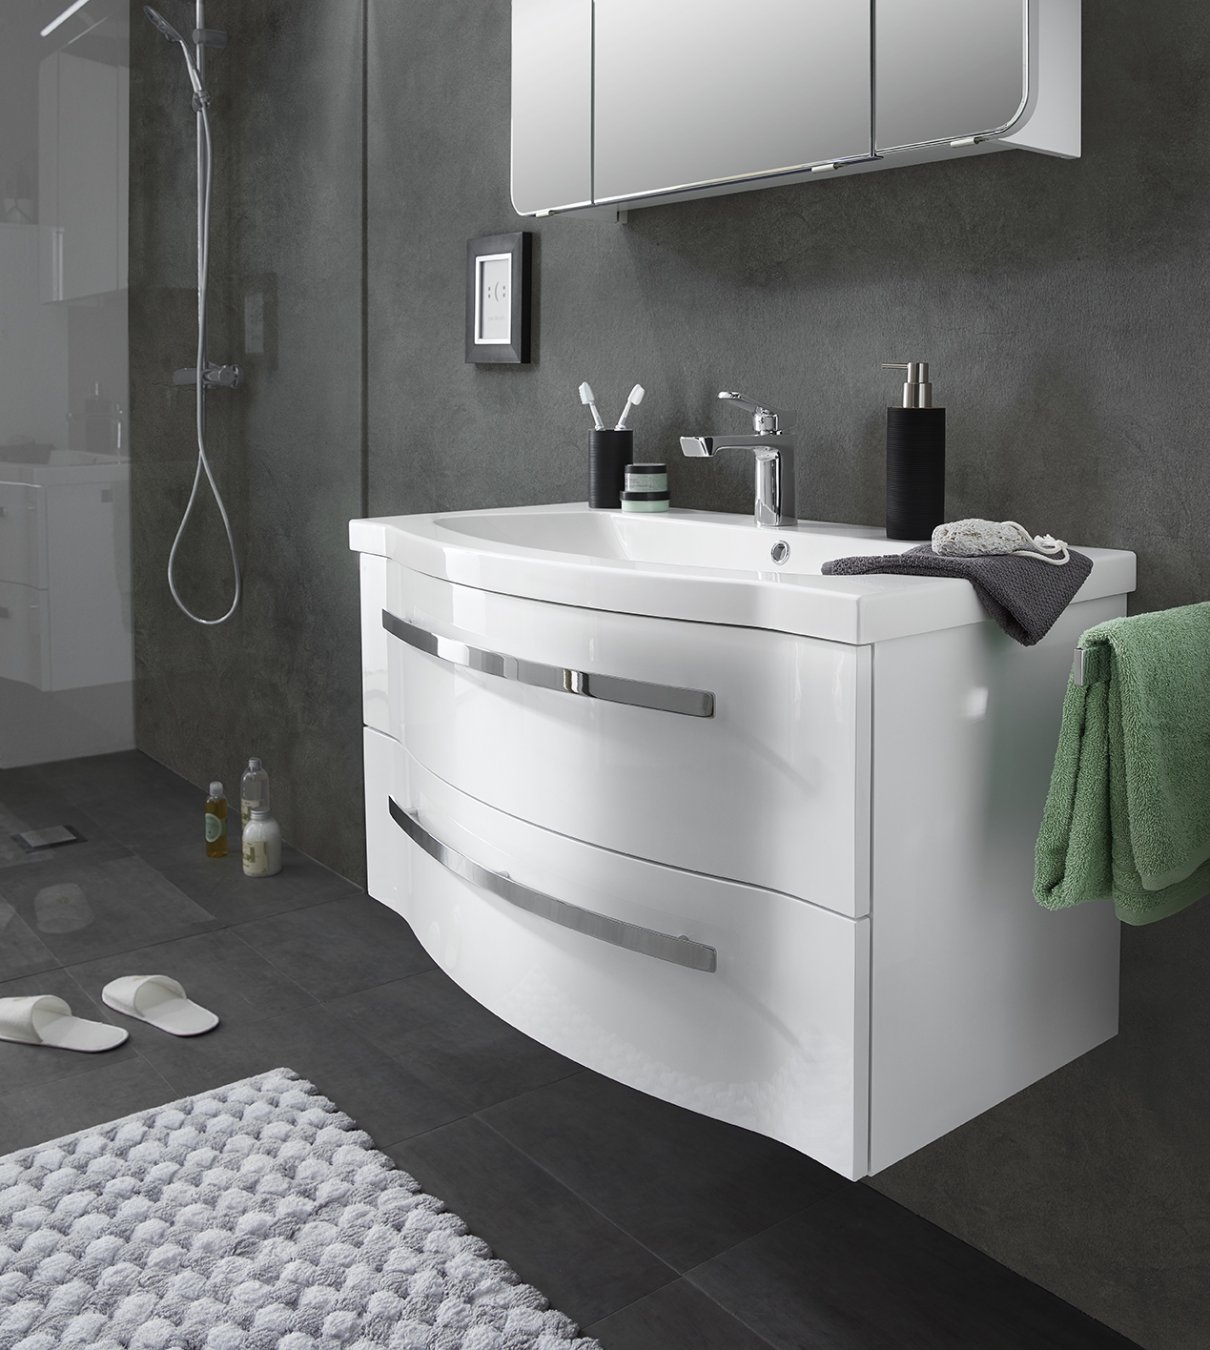 pelipal fokus 4005 set a badm bel block. Black Bedroom Furniture Sets. Home Design Ideas